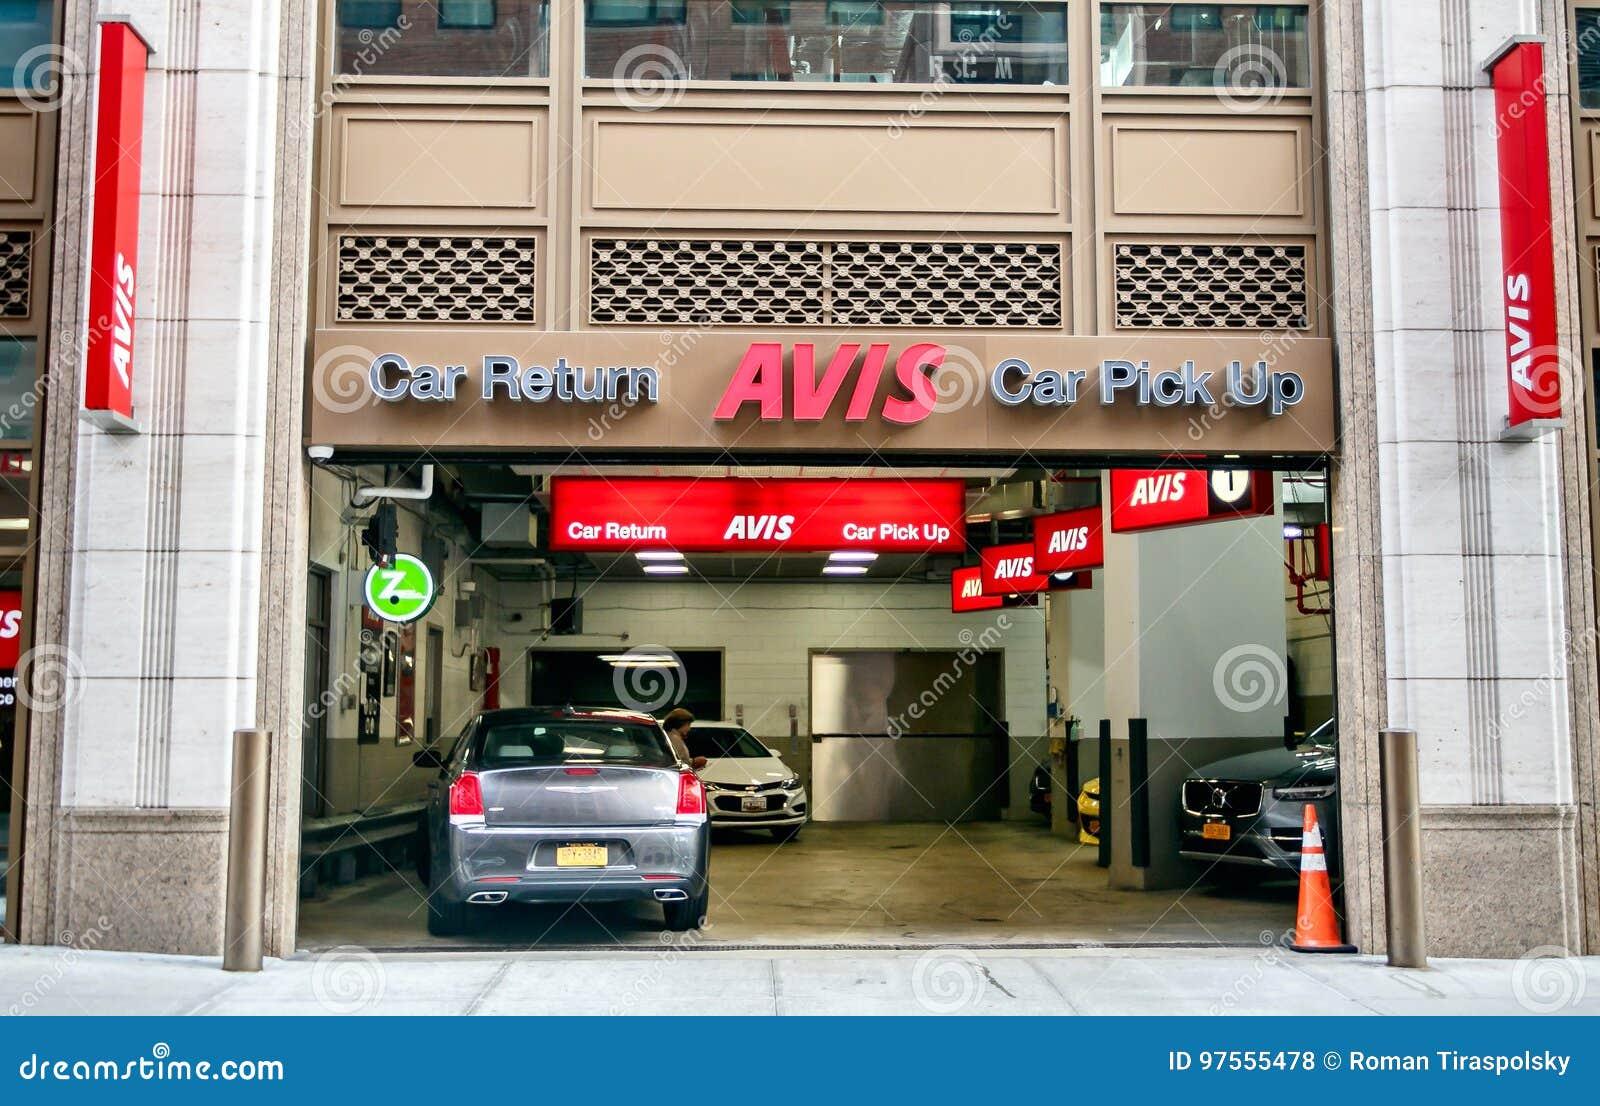 Car Rental Manhattan >> Avis Rental Car Branch Editorial Stock Photo Image Of Avis 97555478